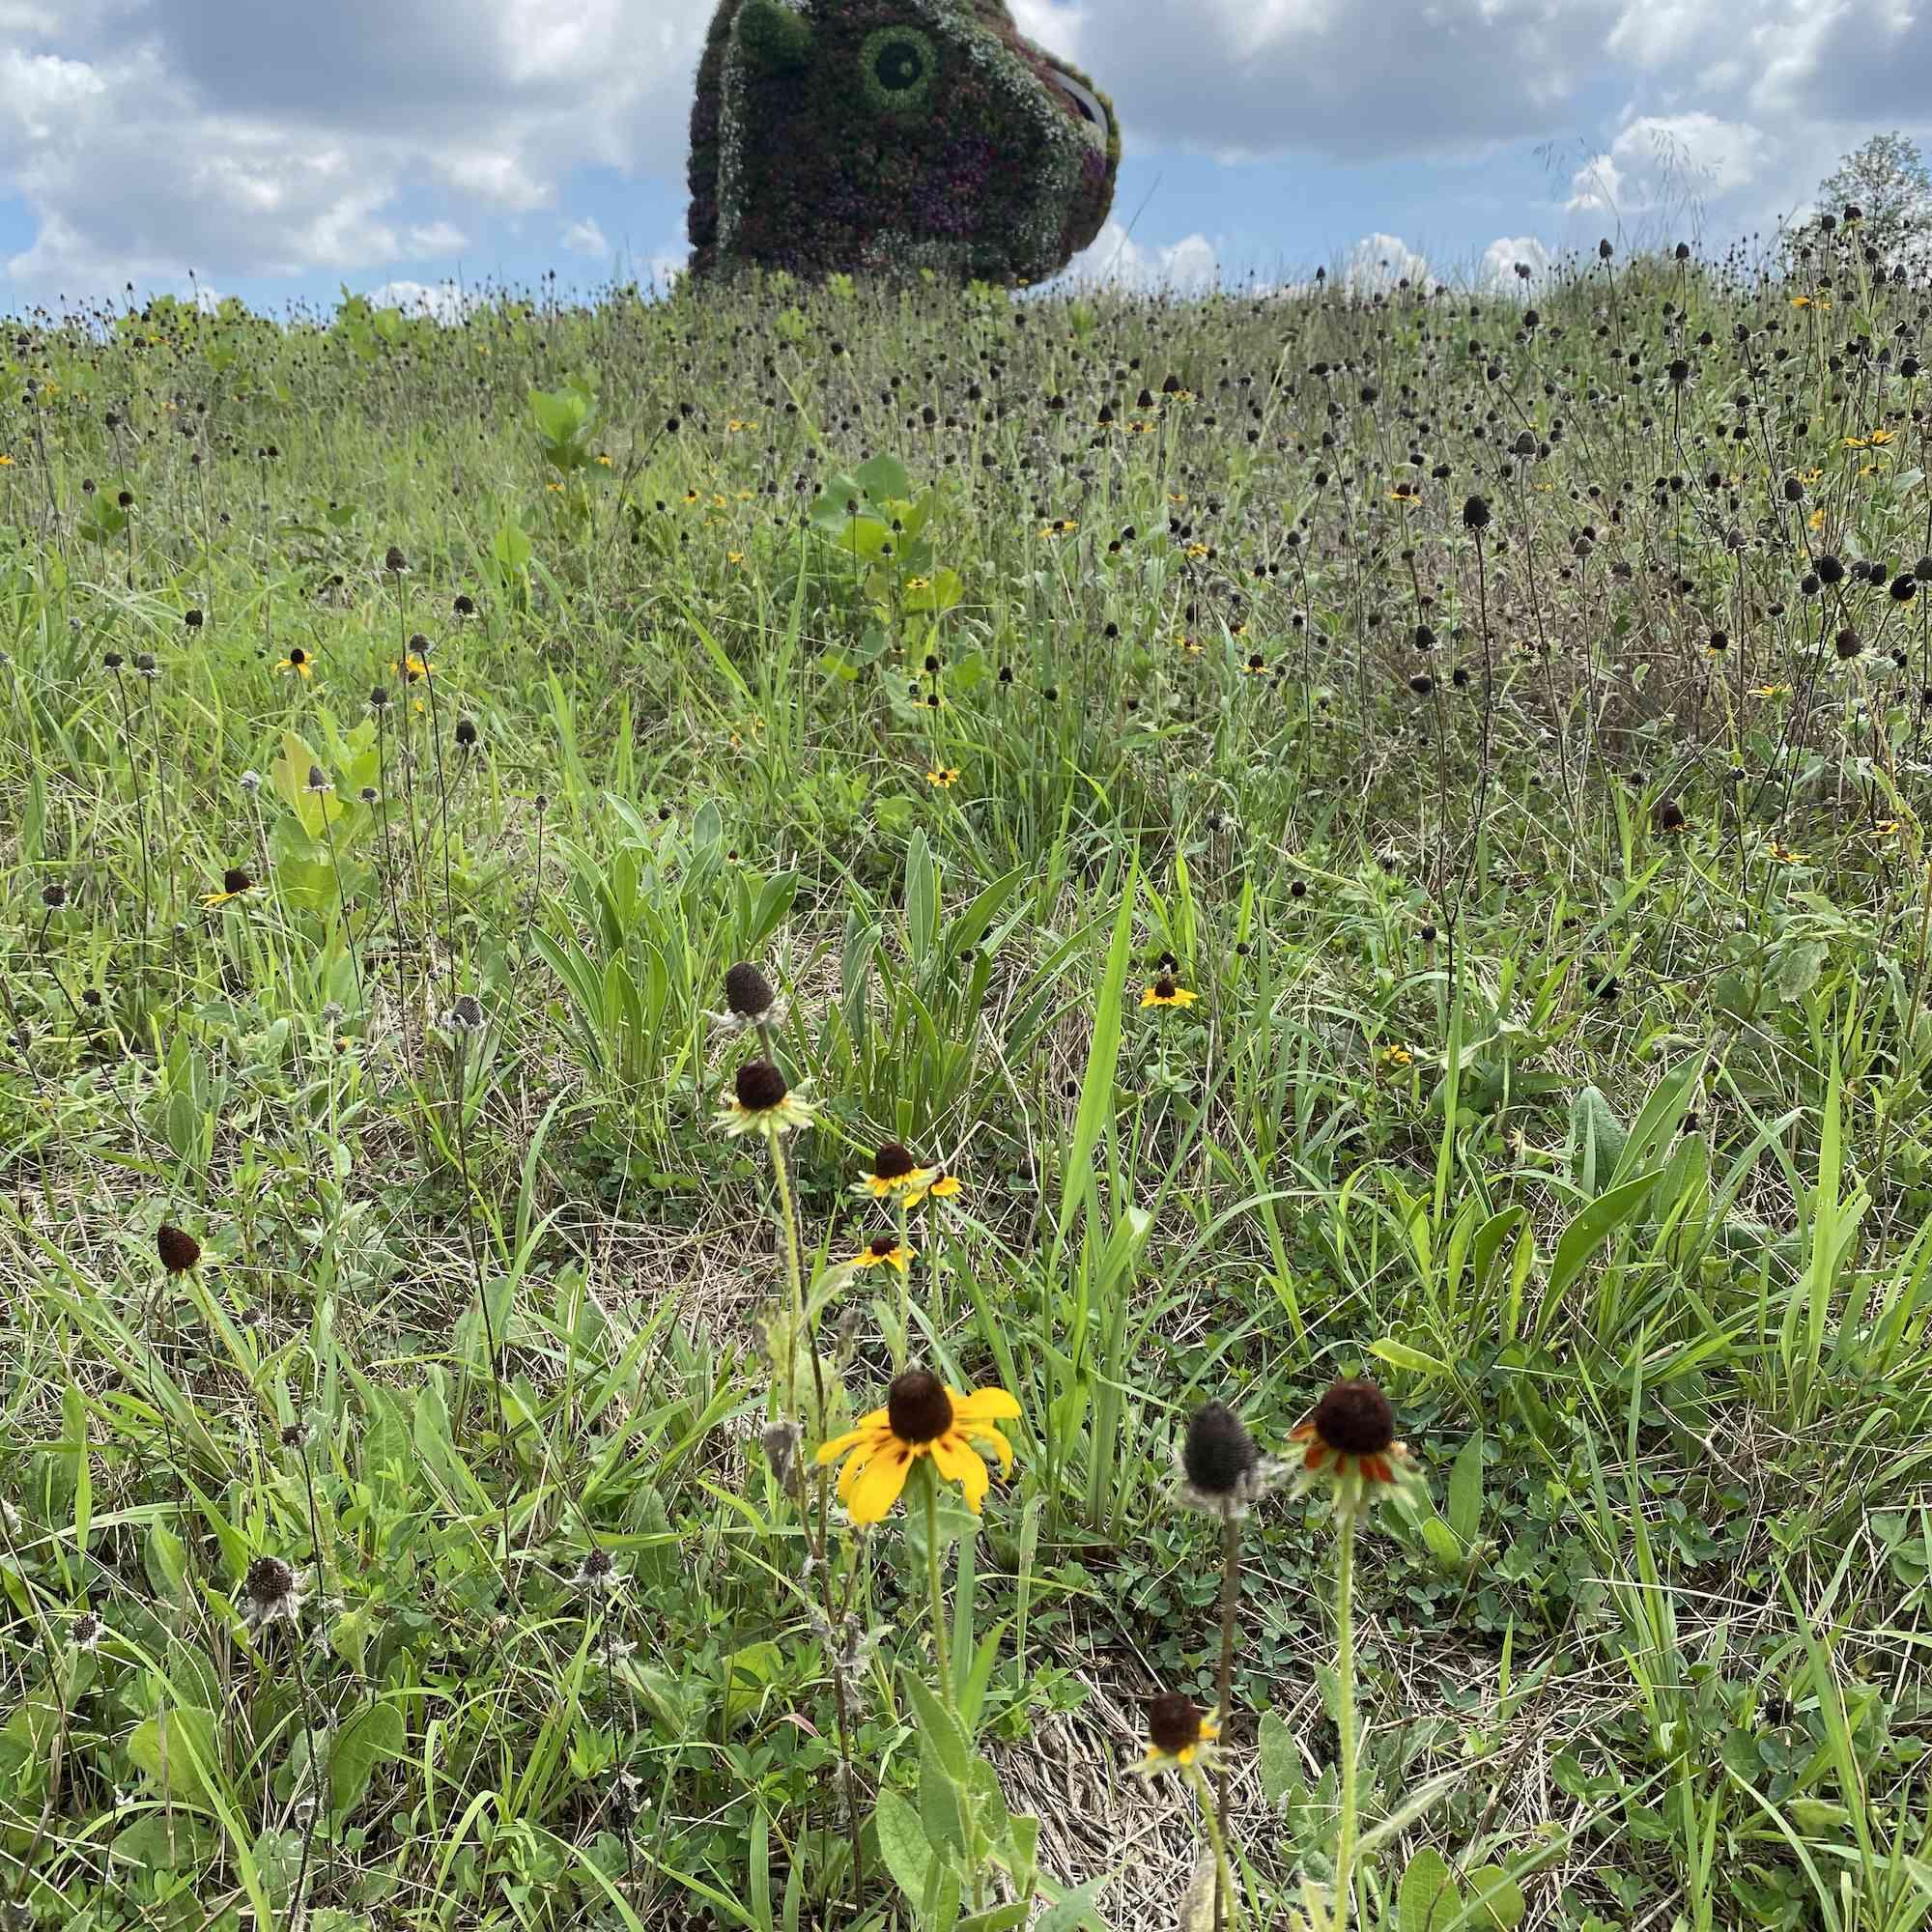 head of cartoonish dinosaur topiary seen above tall grass